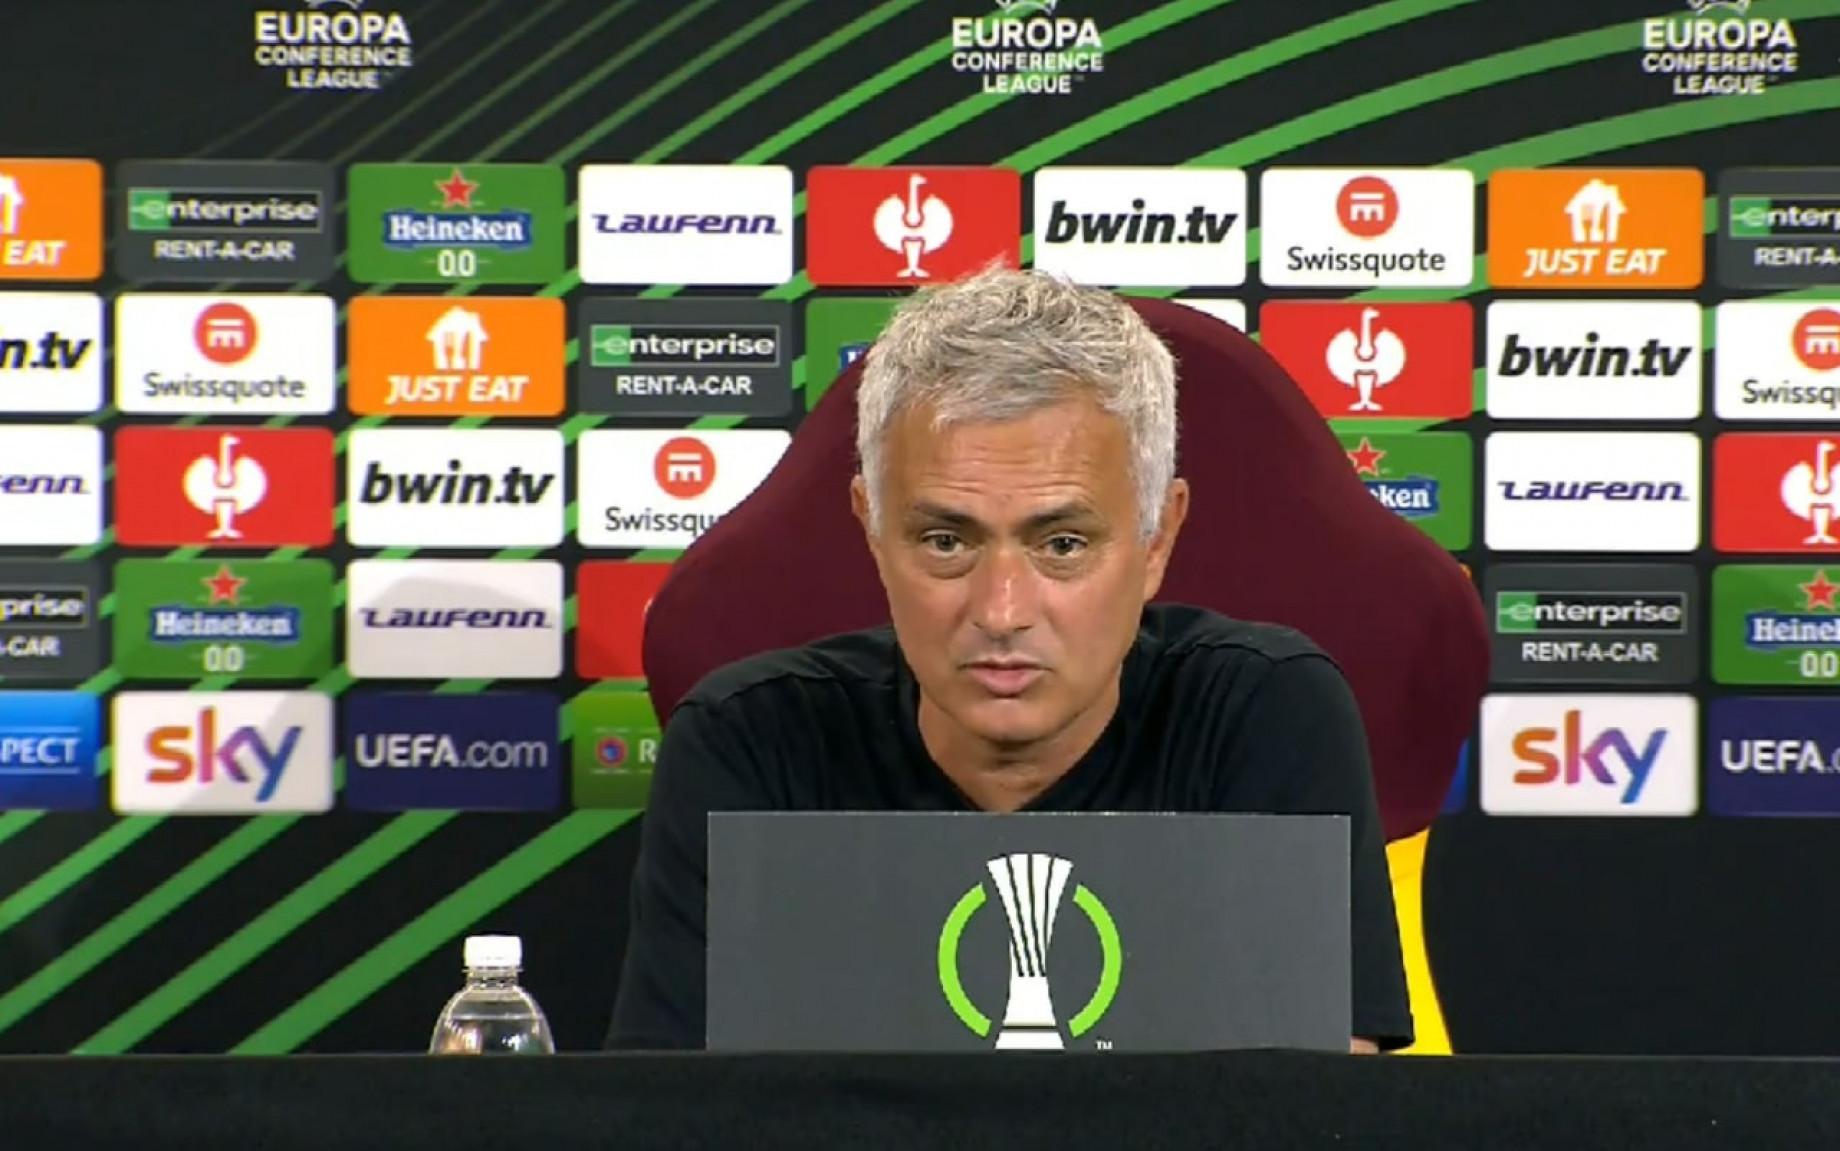 mourinho-screen-gpo-1.jpg